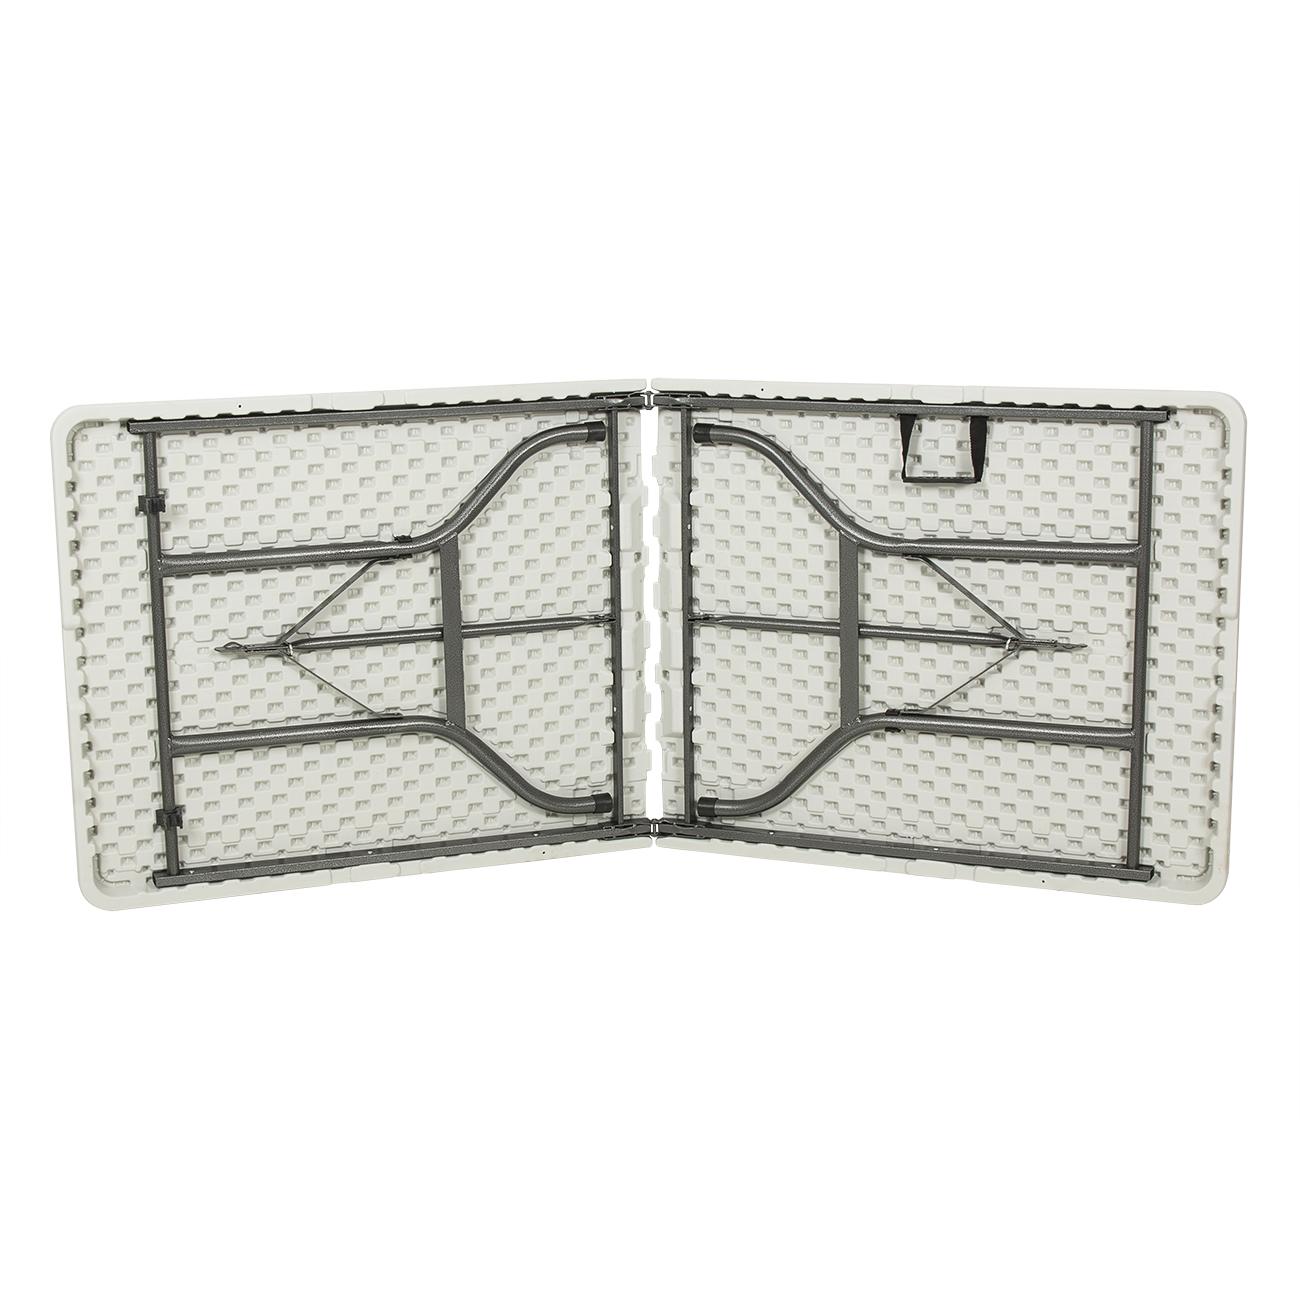 portable 6 ft foot 72 white long plastic center folding lifetime picnic table. Black Bedroom Furniture Sets. Home Design Ideas